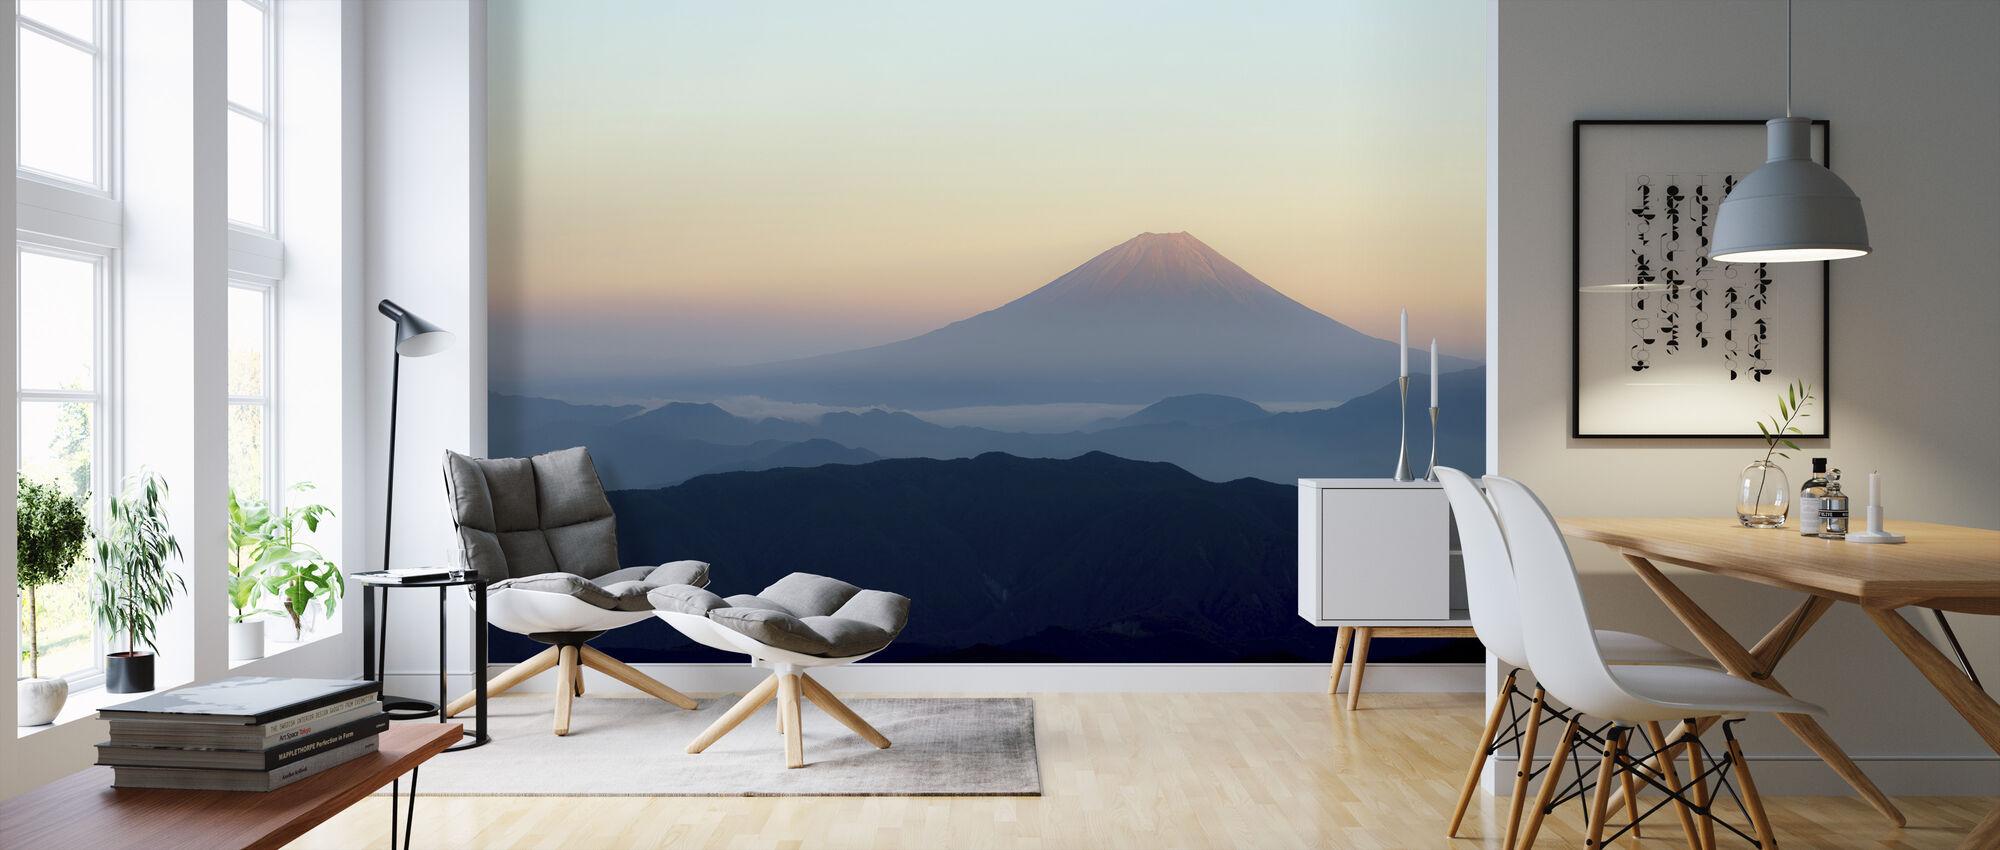 Mt. Fuji - Papel pintado - Salón